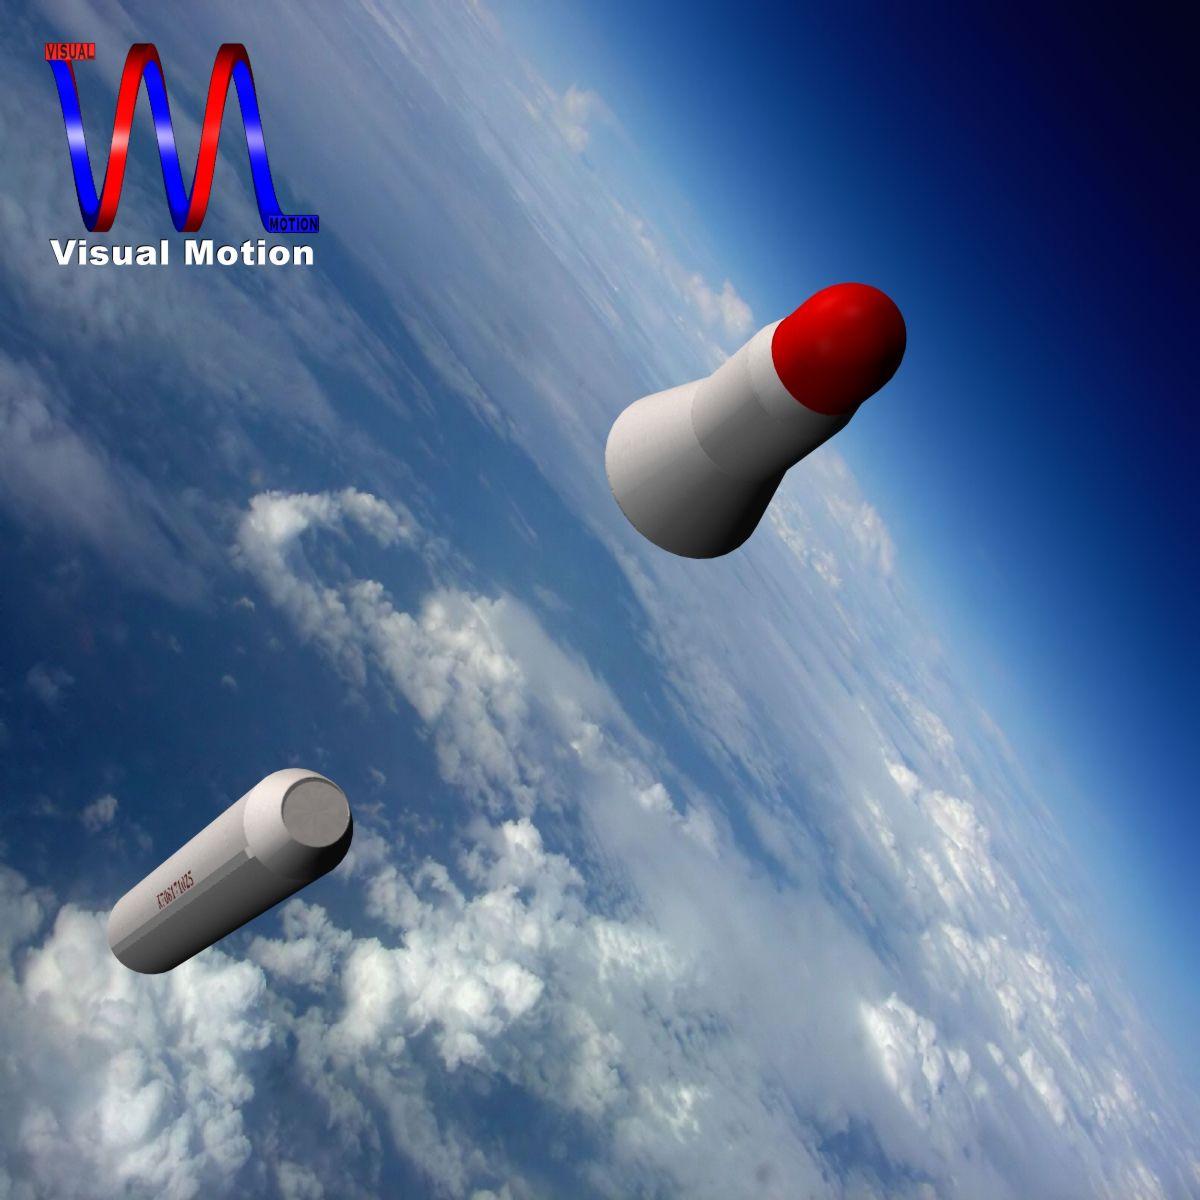 dprk bm25 musudan missile 3d model 3ds dxf x cod scn obj 149589